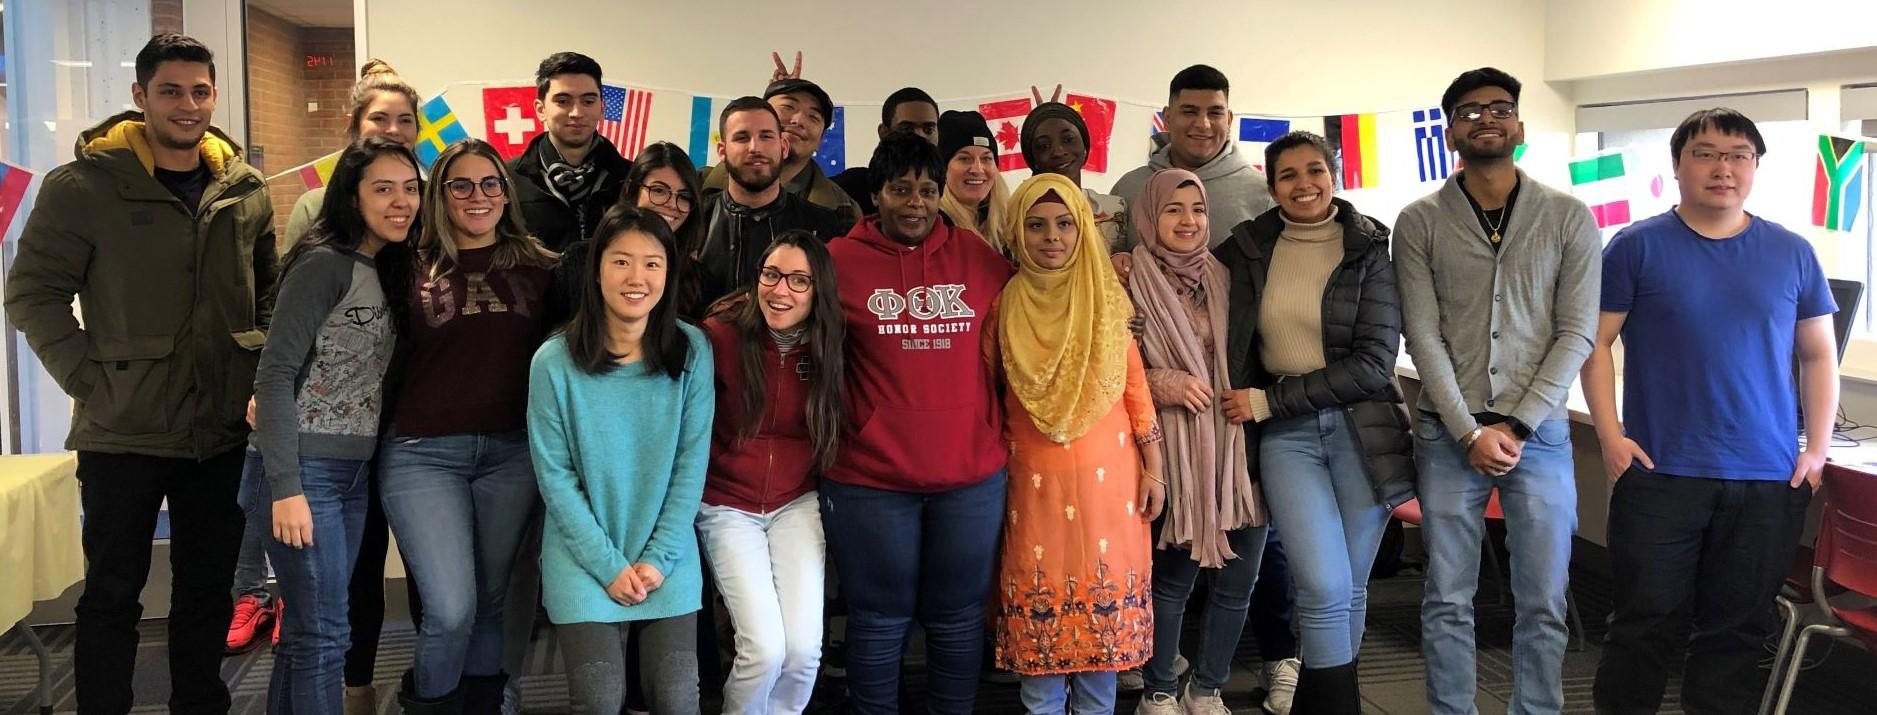 International Students - Delaware County Community College Regarding Delaware County Community College Academic Calendar 2021